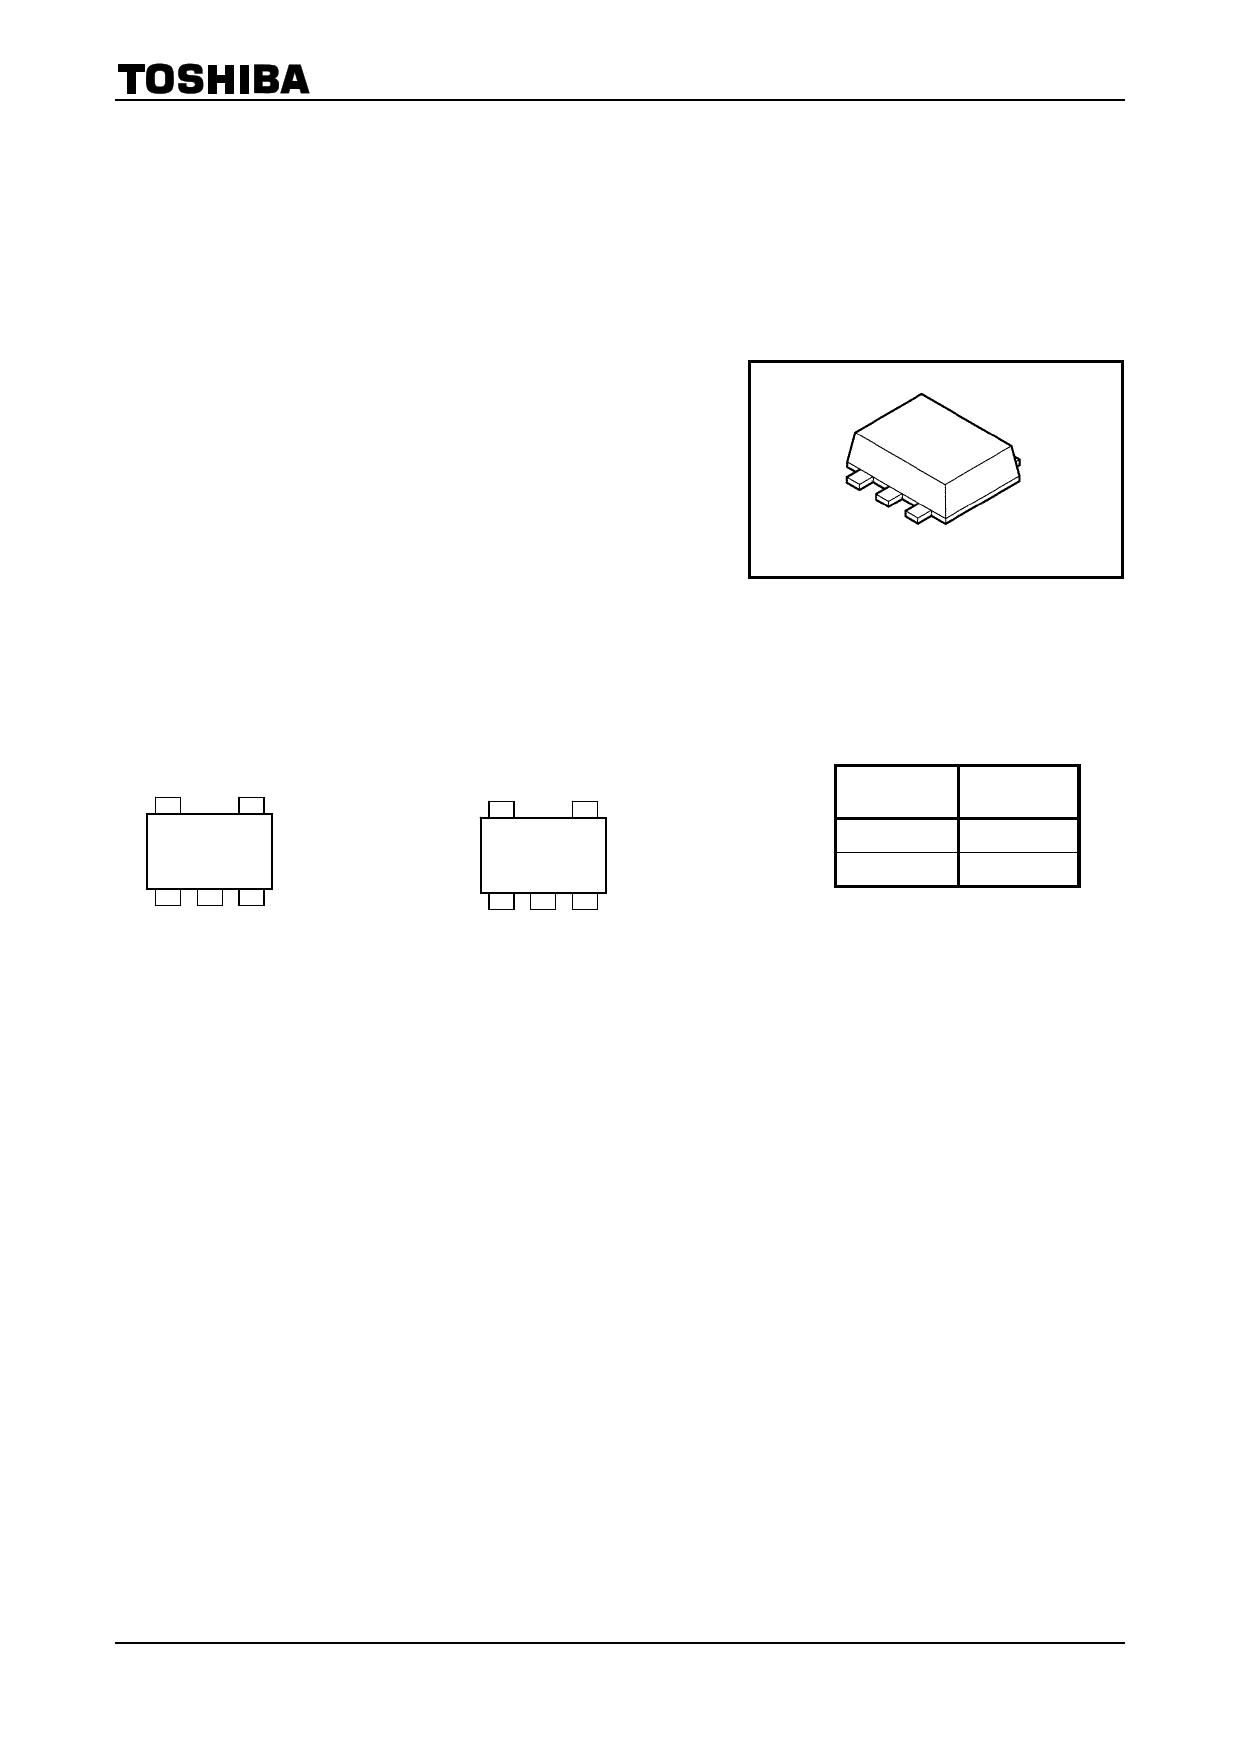 TCS10SLU 데이터시트 및 TCS10SLU PDF